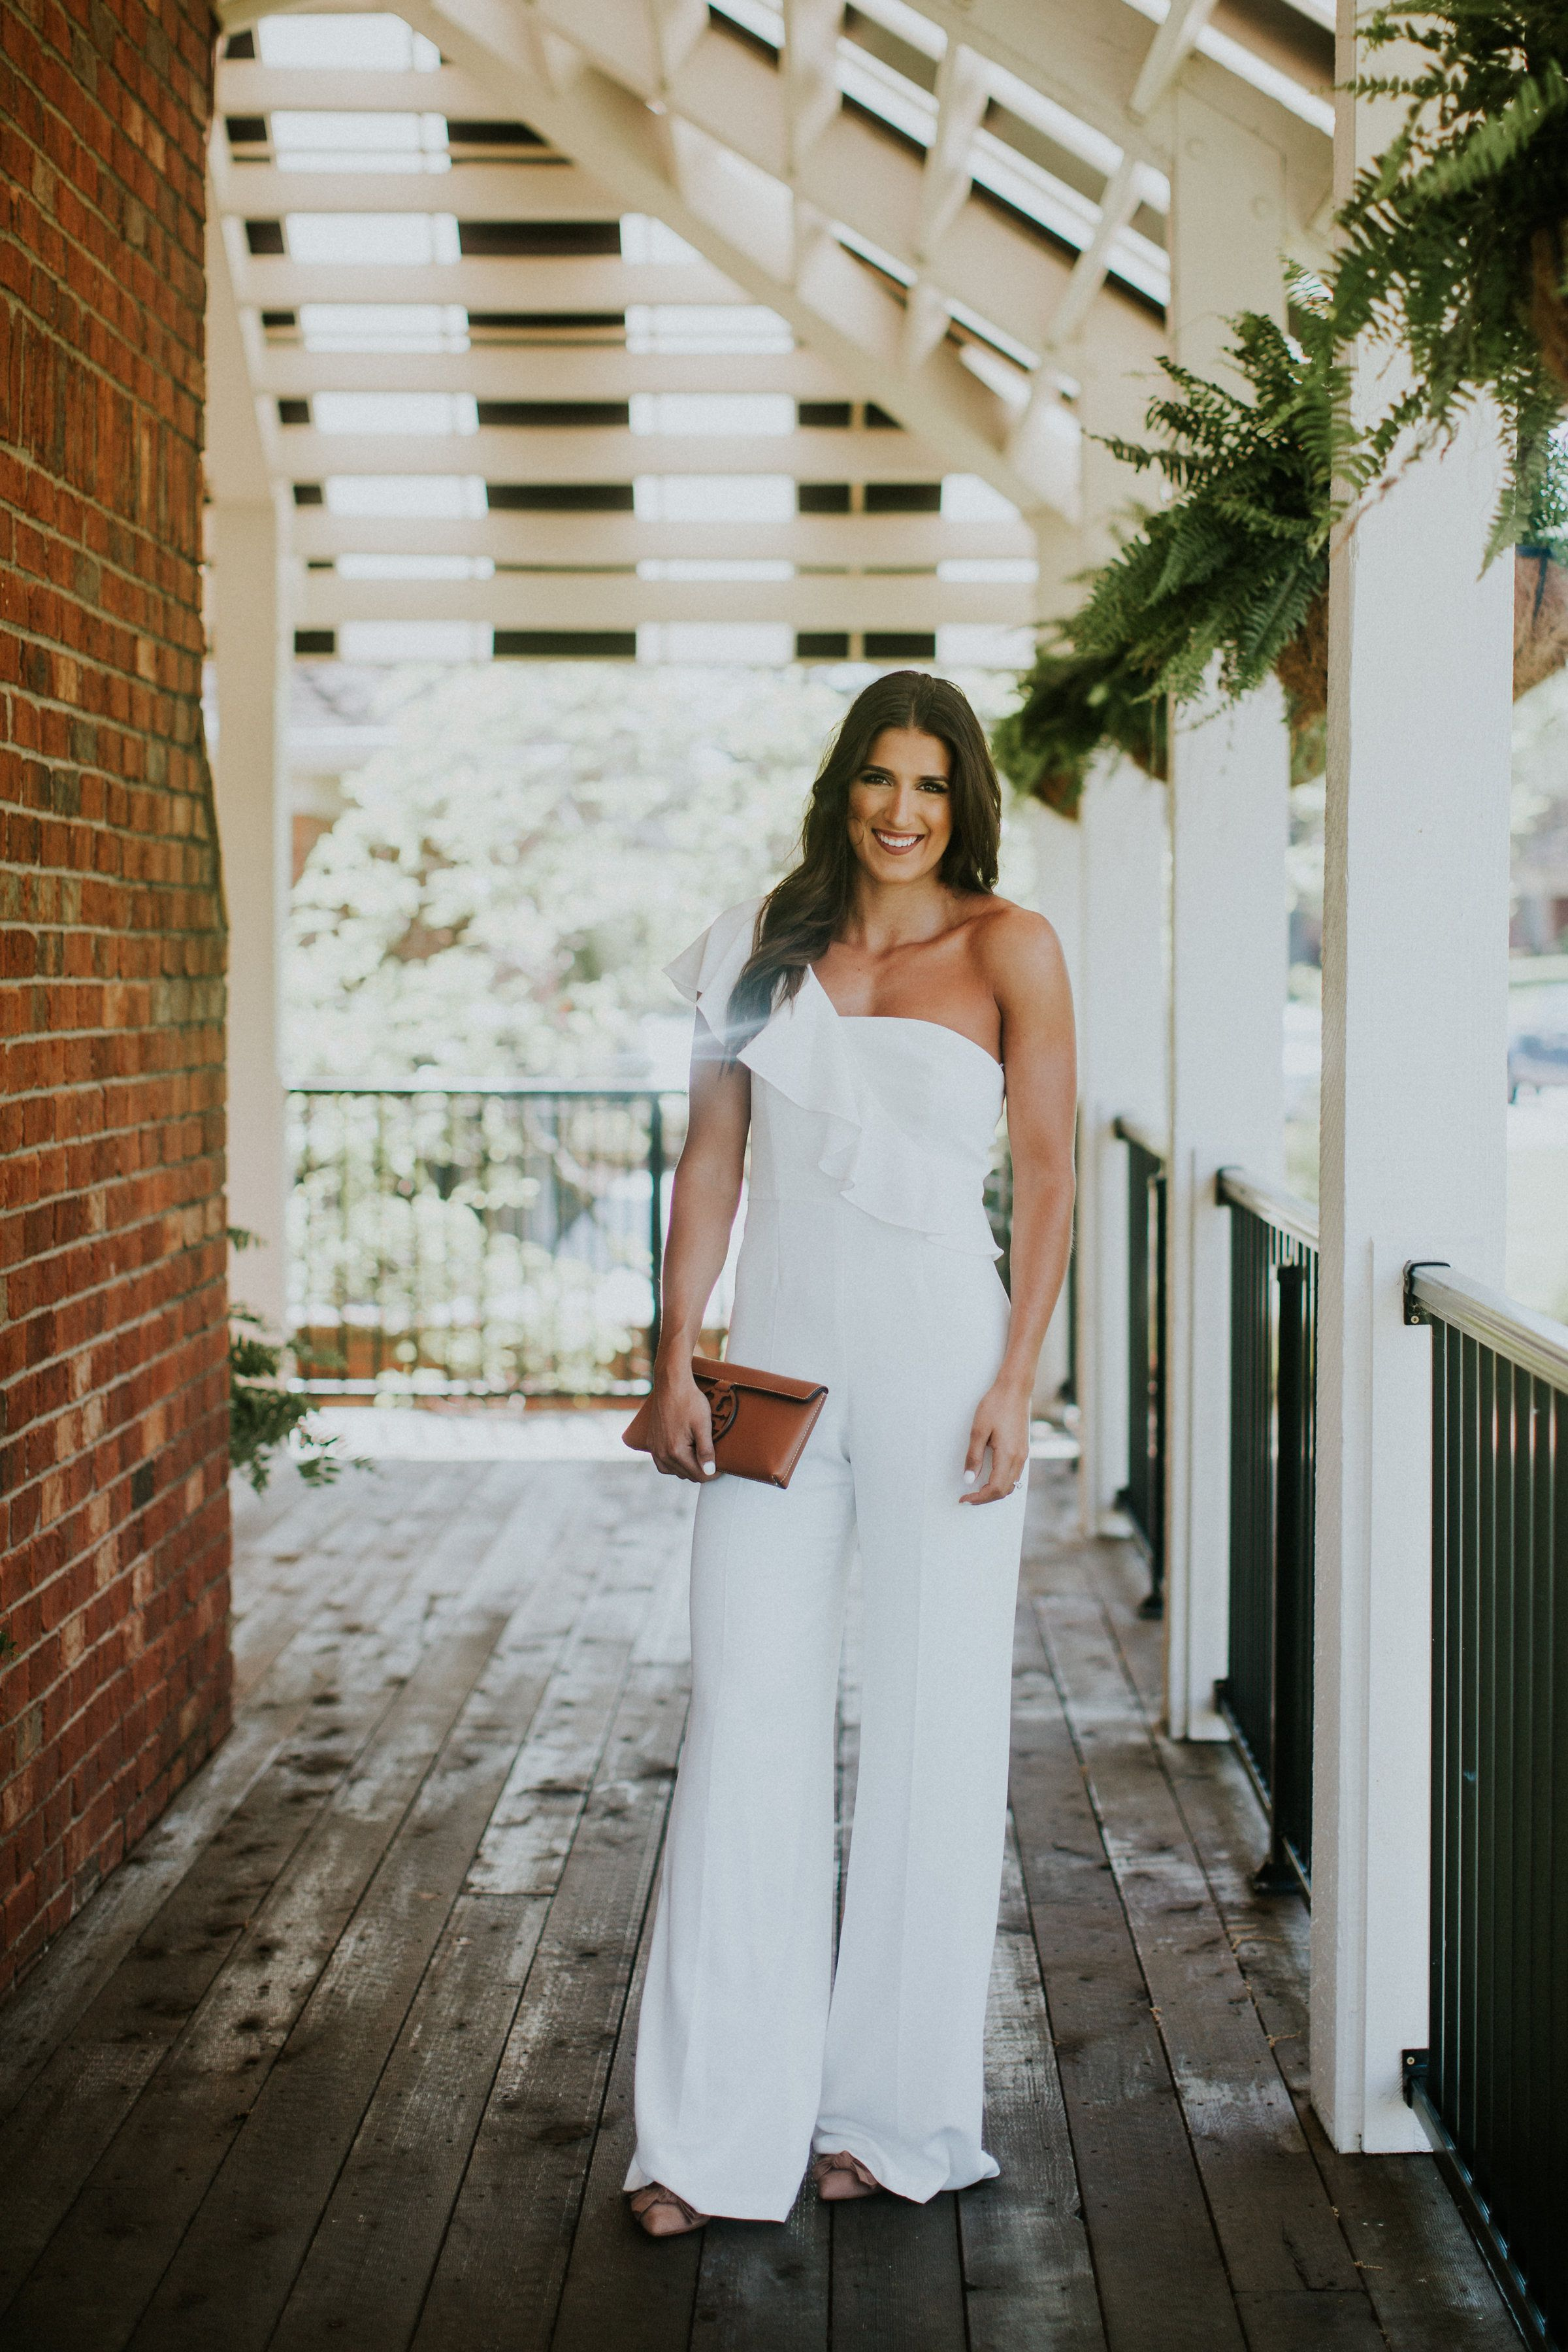 Jay Godfrey Bridal Shop A Southern Drawl White Dress Summer White Lace Mini Dress Bridal Jumpsuit [ 3600 x 2400 Pixel ]